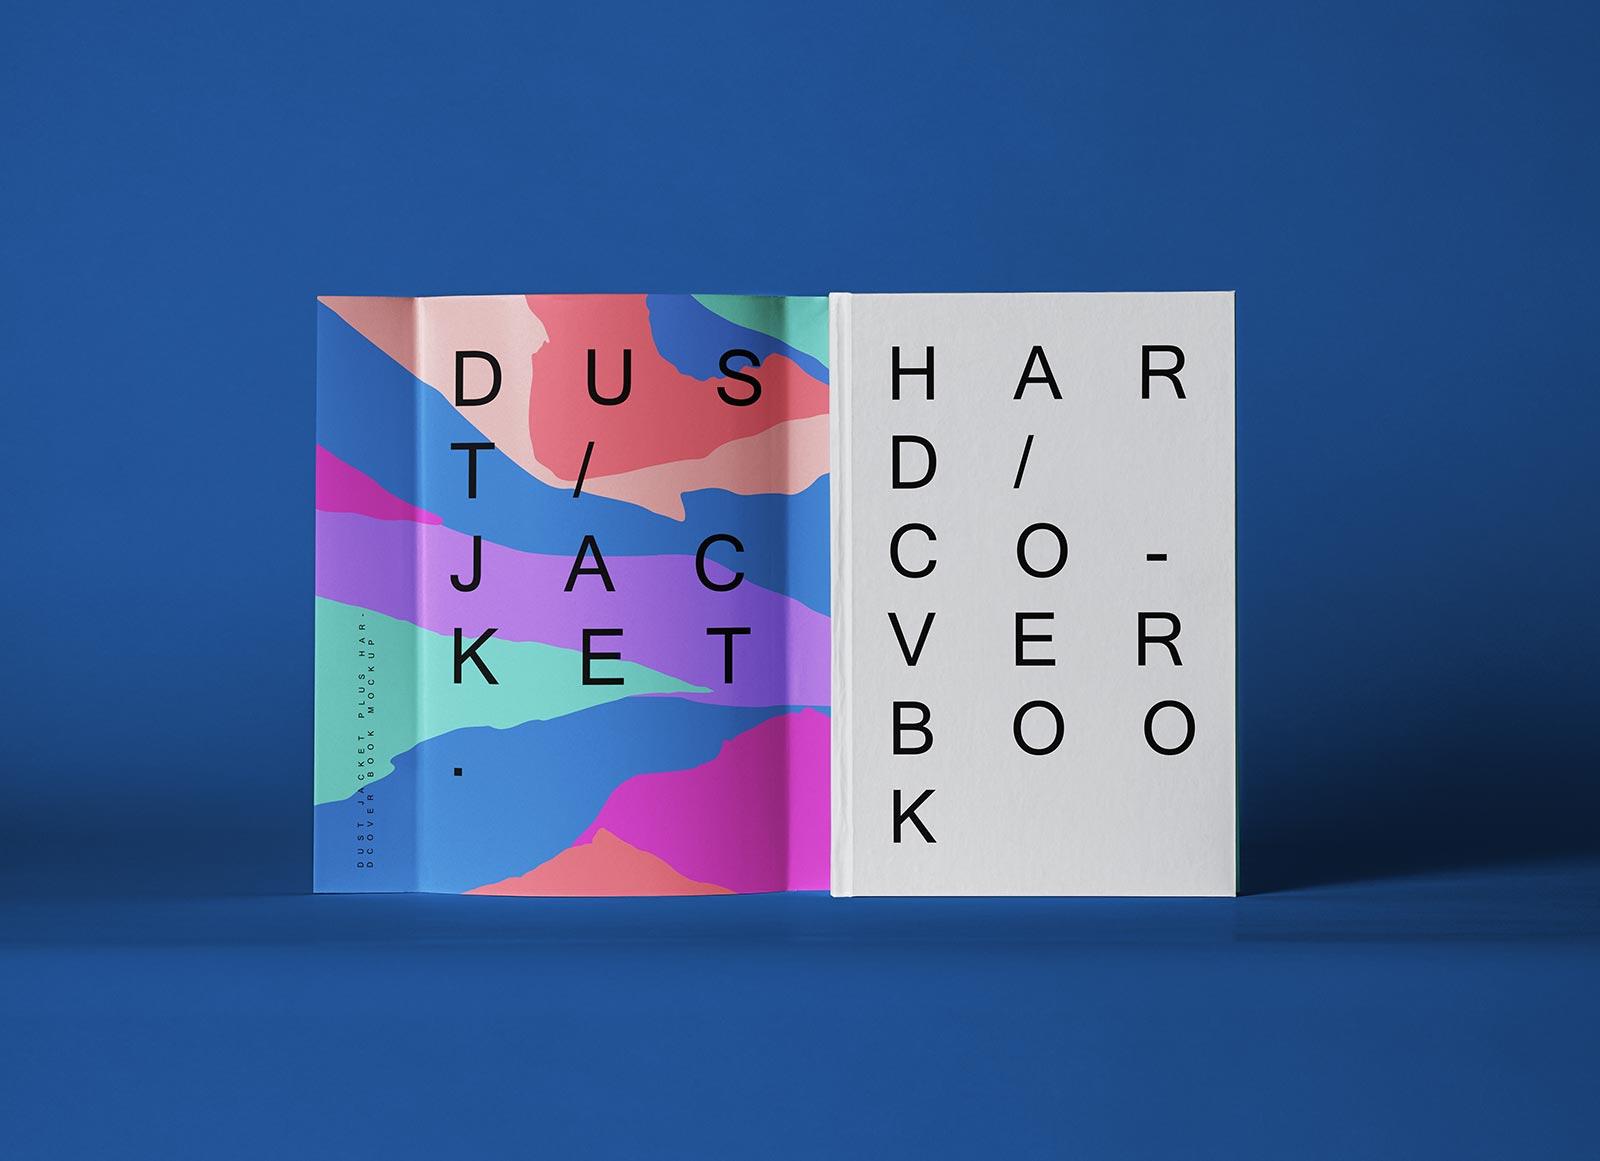 Free Dust Jacket Hardcover Book Mockup PSD